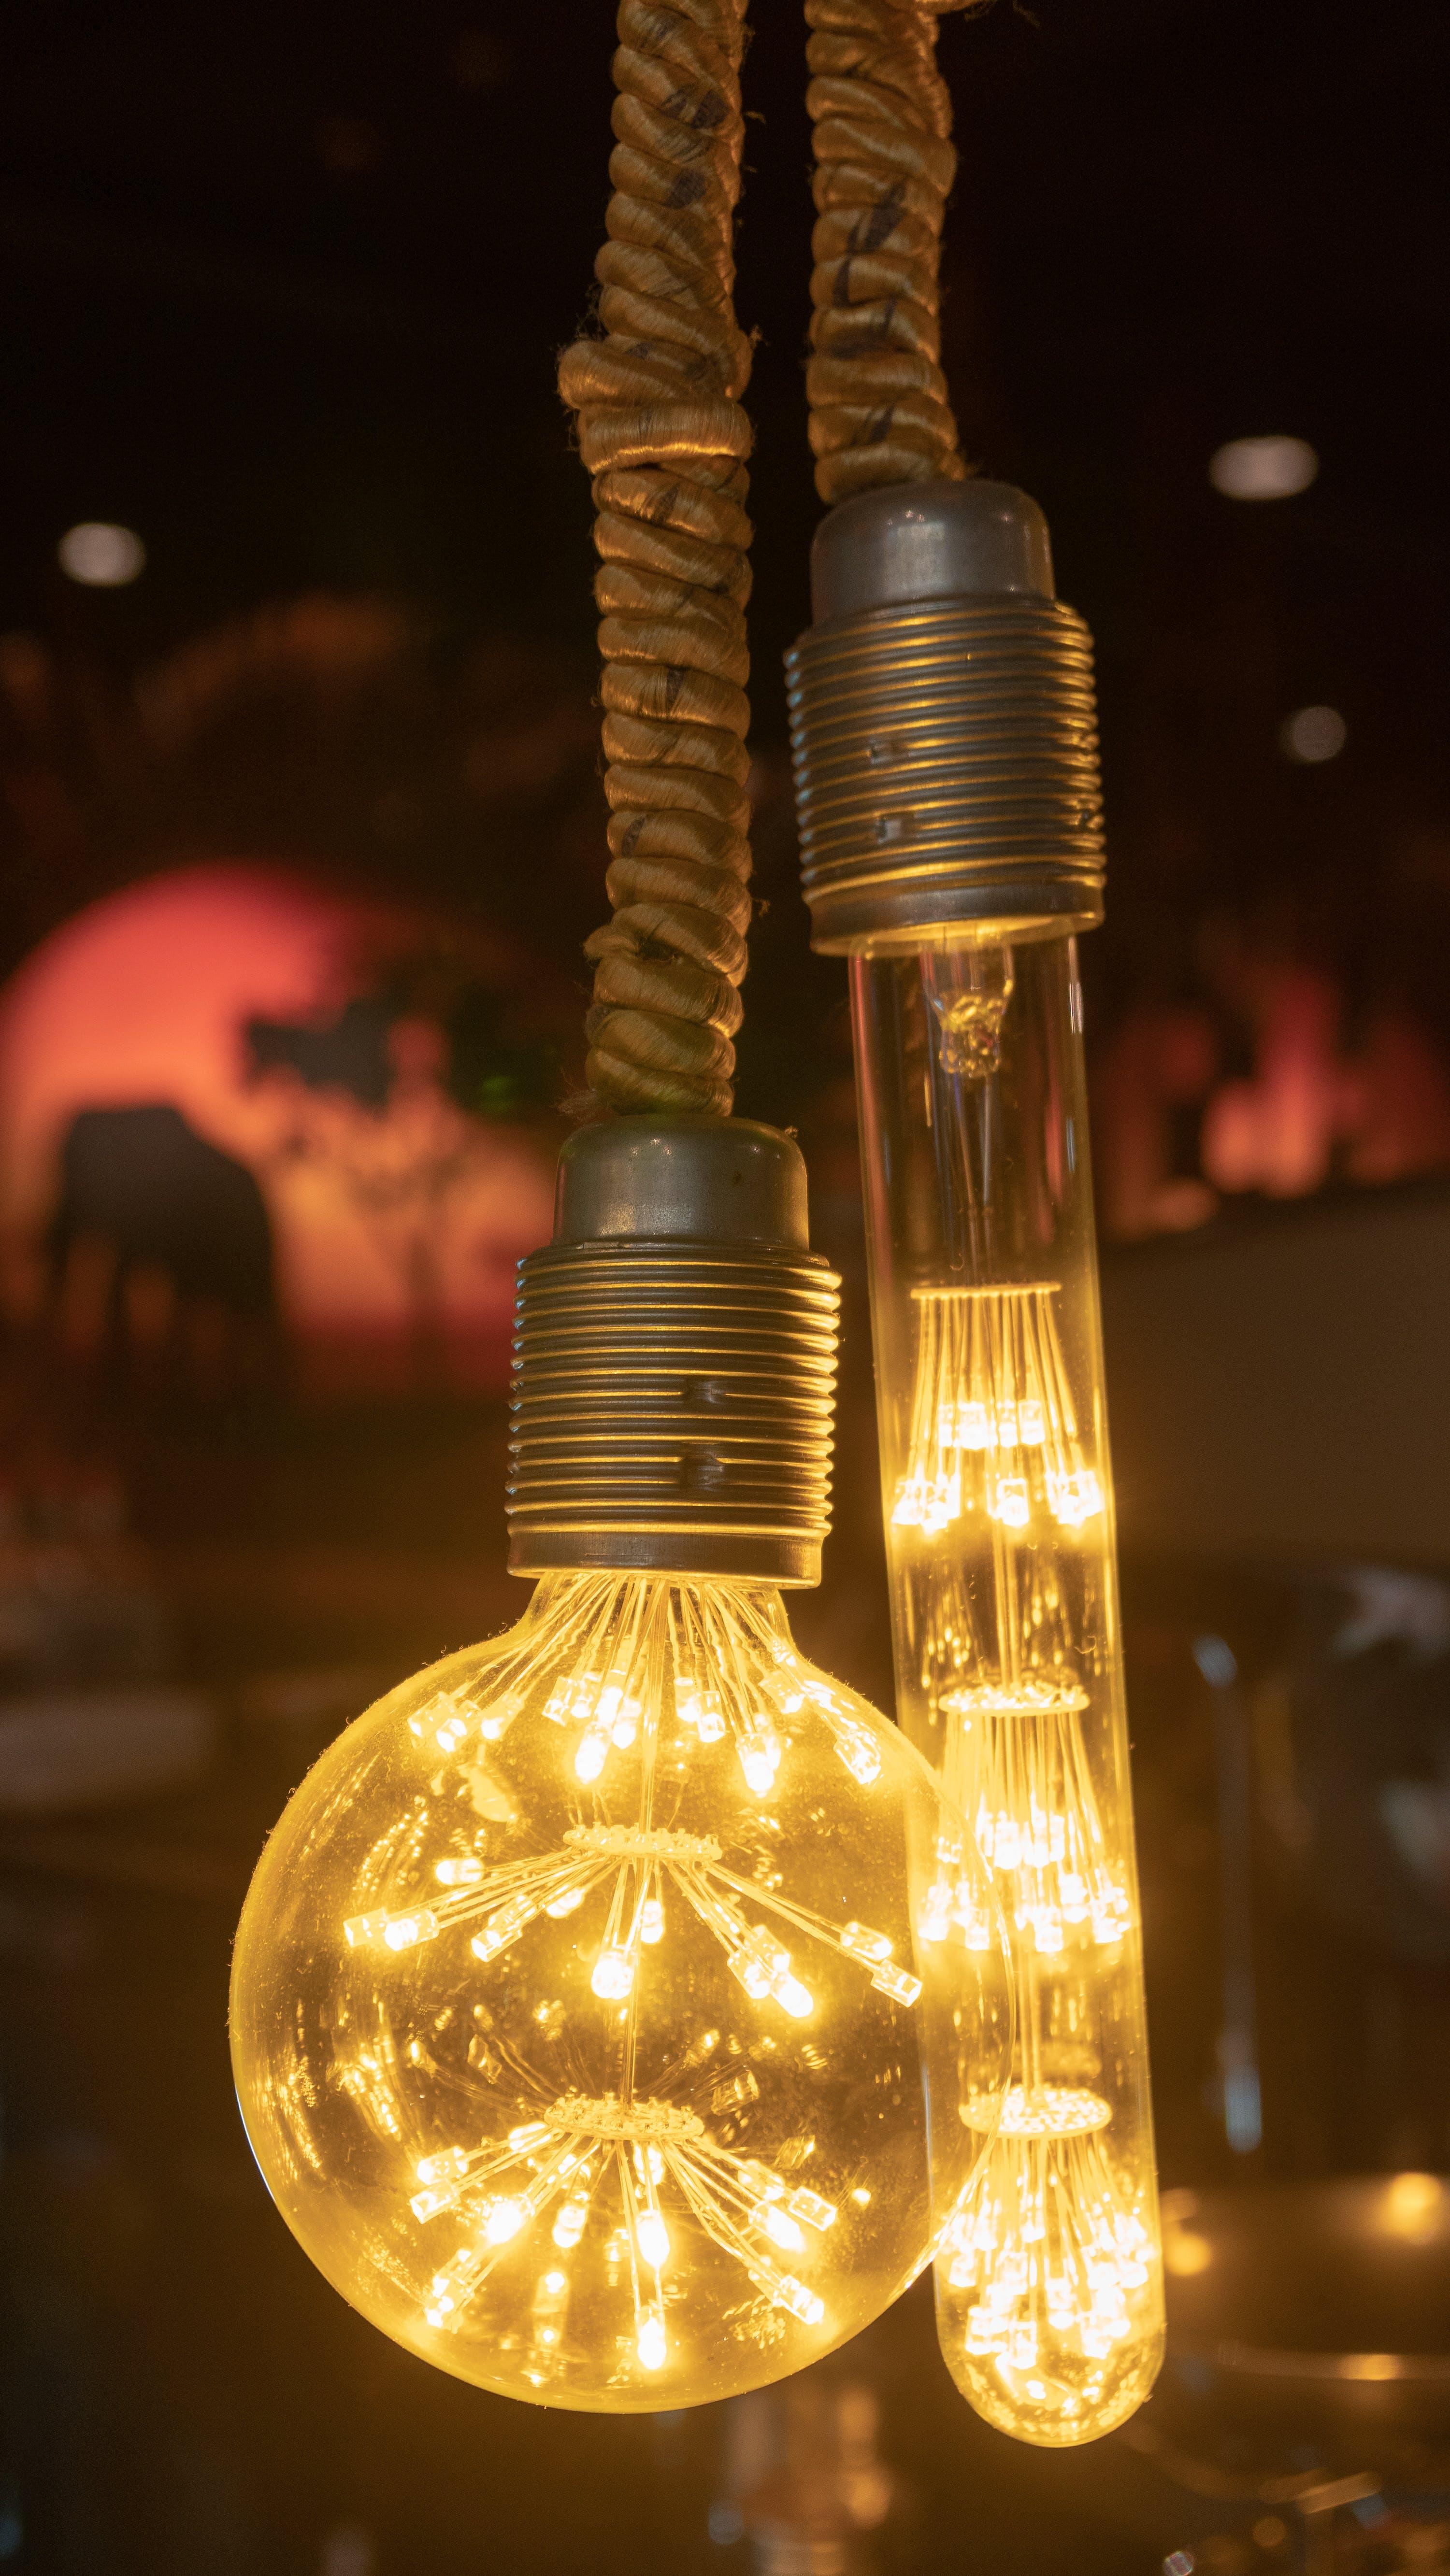 Kostenloses Stock Foto zu beleuchtung, design, lampe